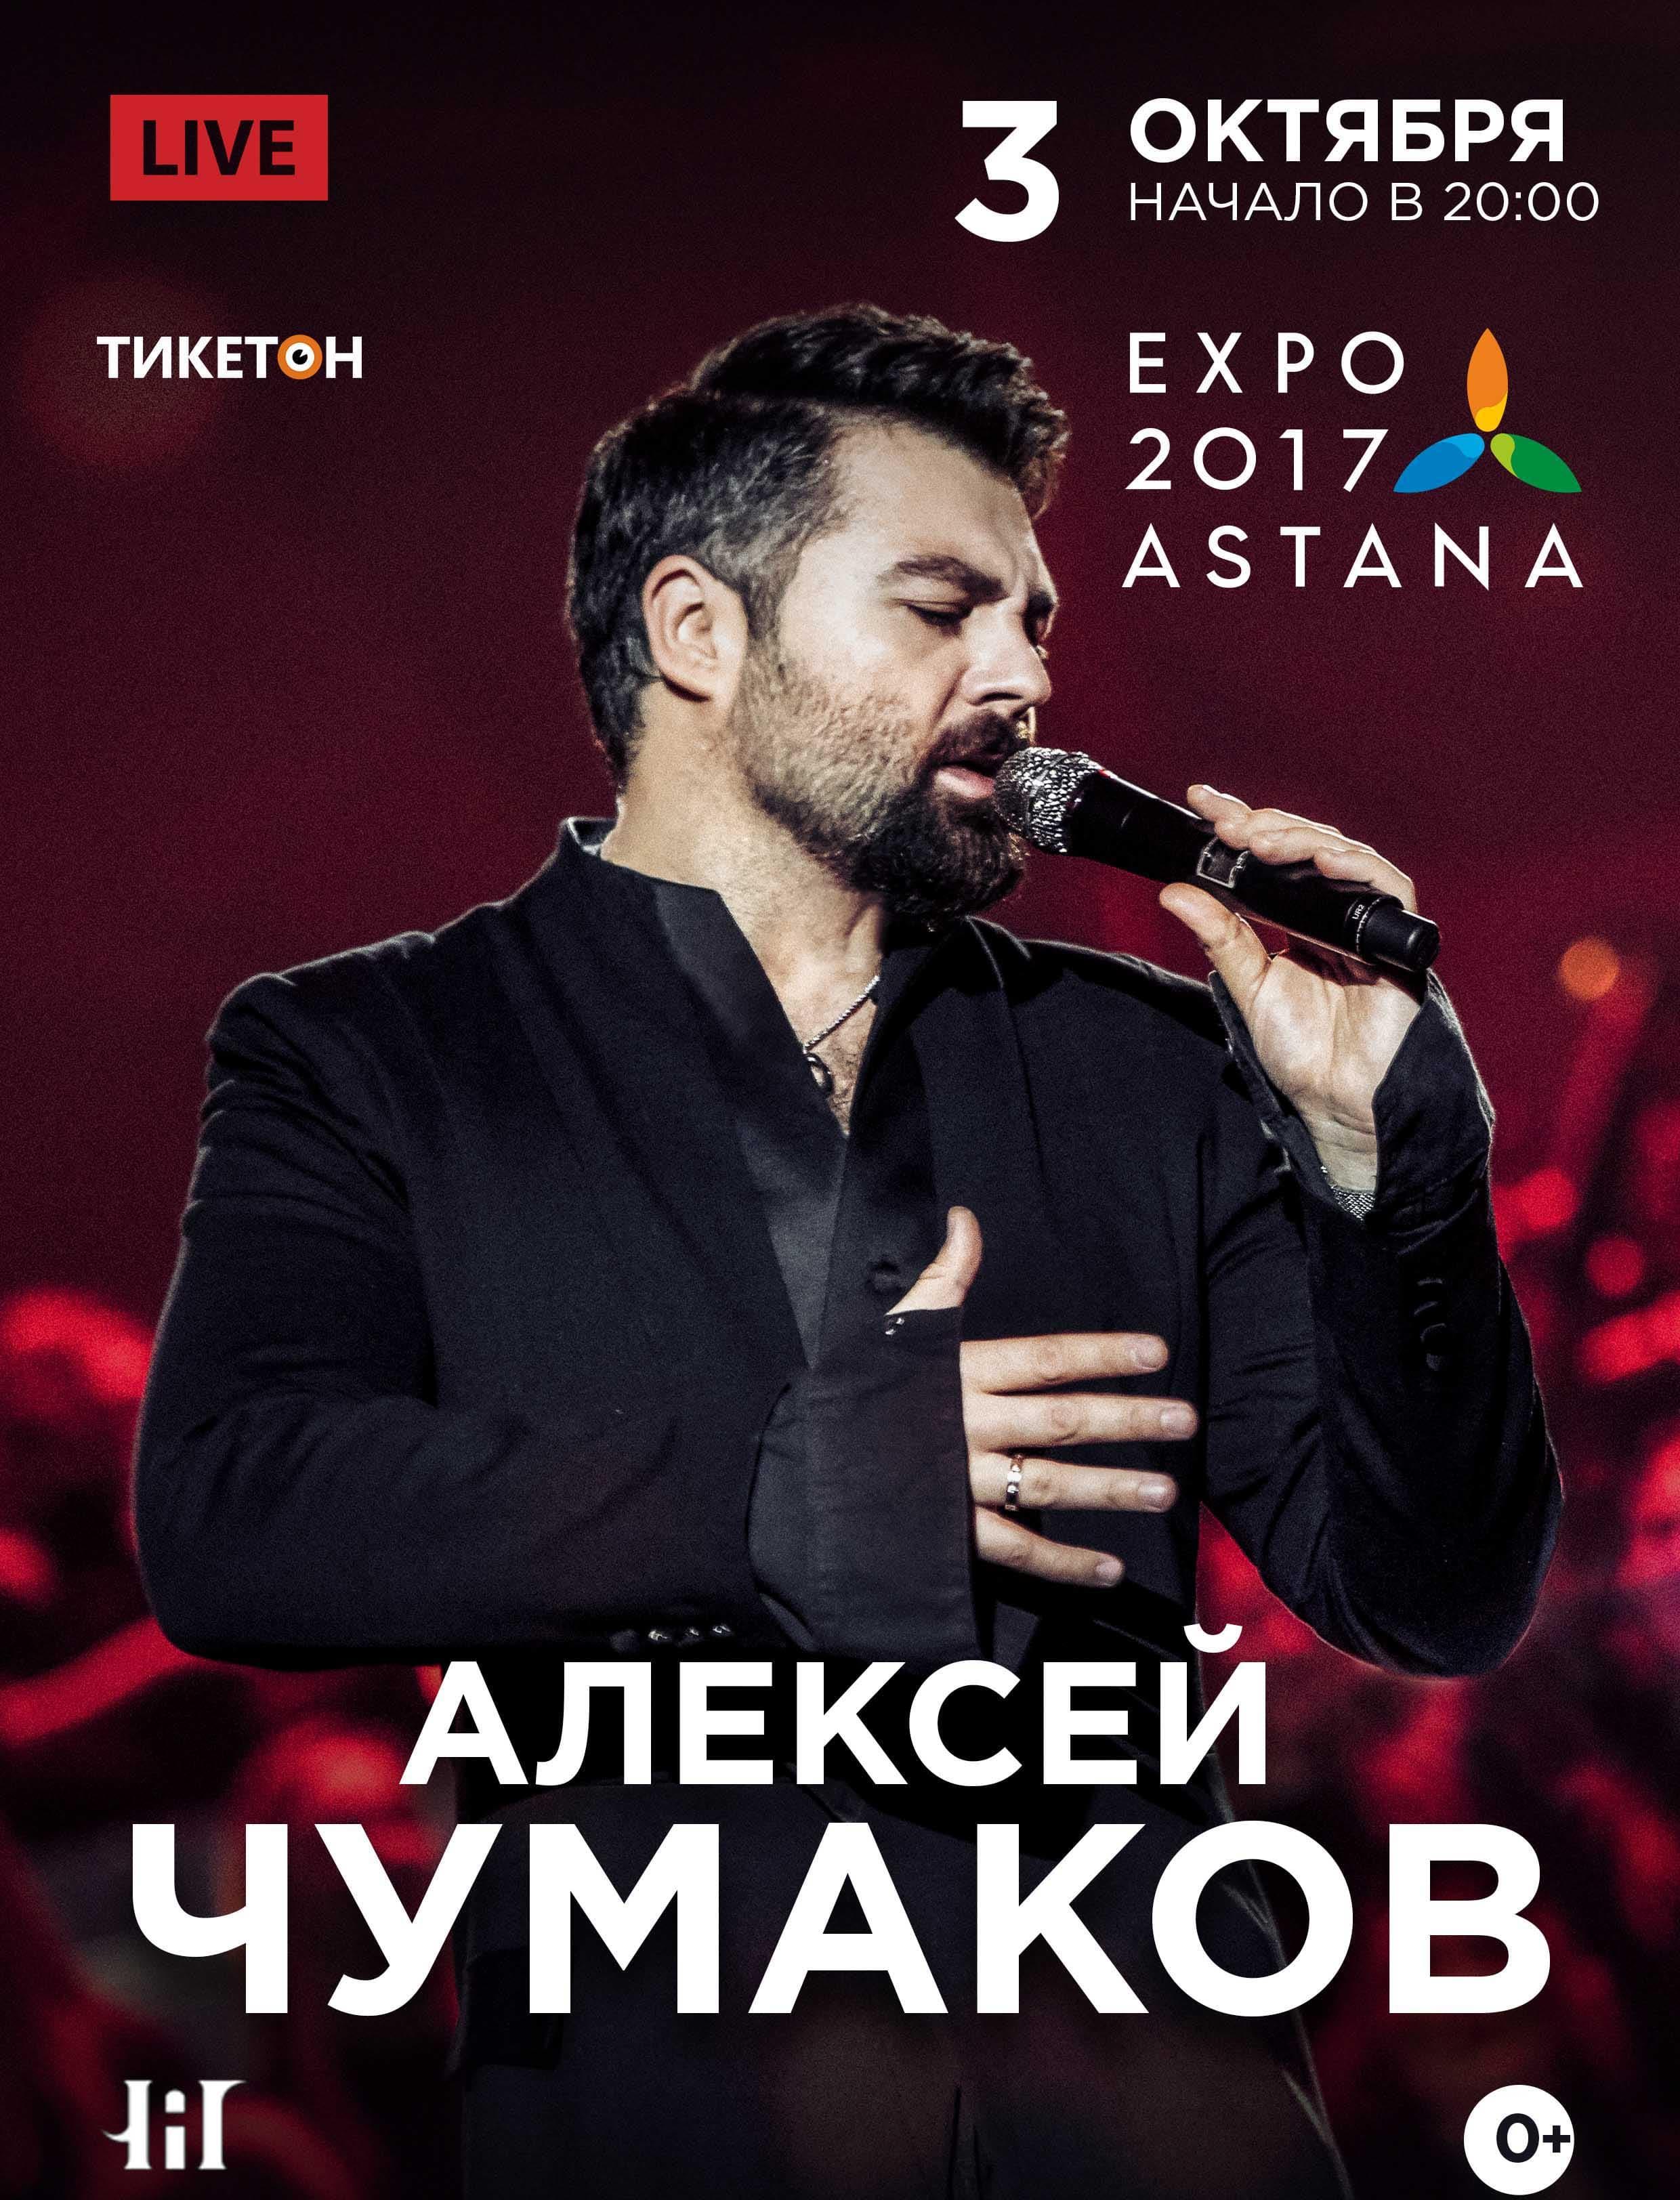 Концерт Алексея Чумакова в Нур-Султане